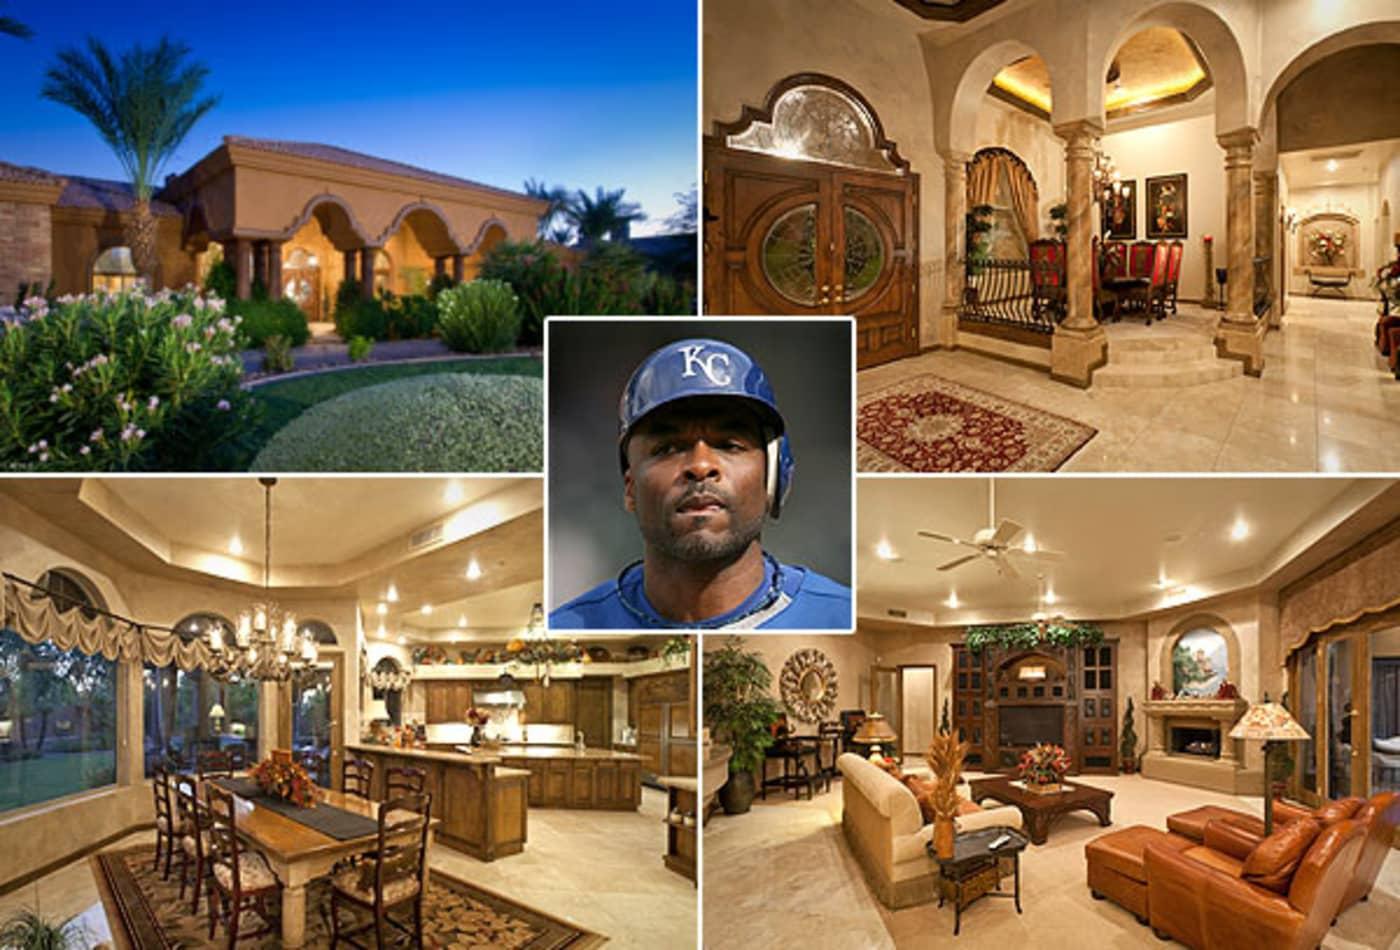 Reggie-Sanders-Baseball-Homes-CNBC.jpg